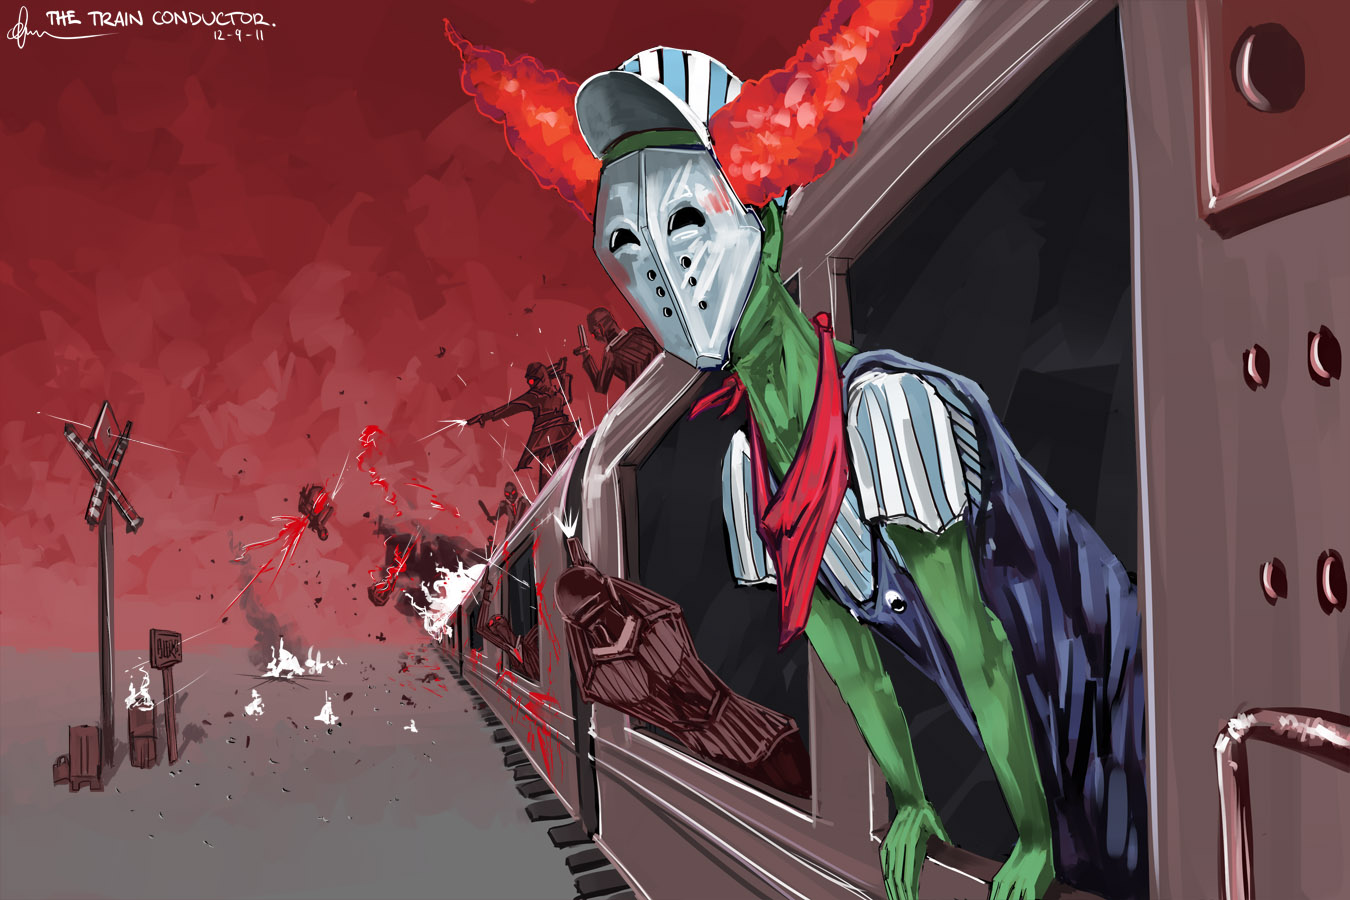 The Train Conductor.